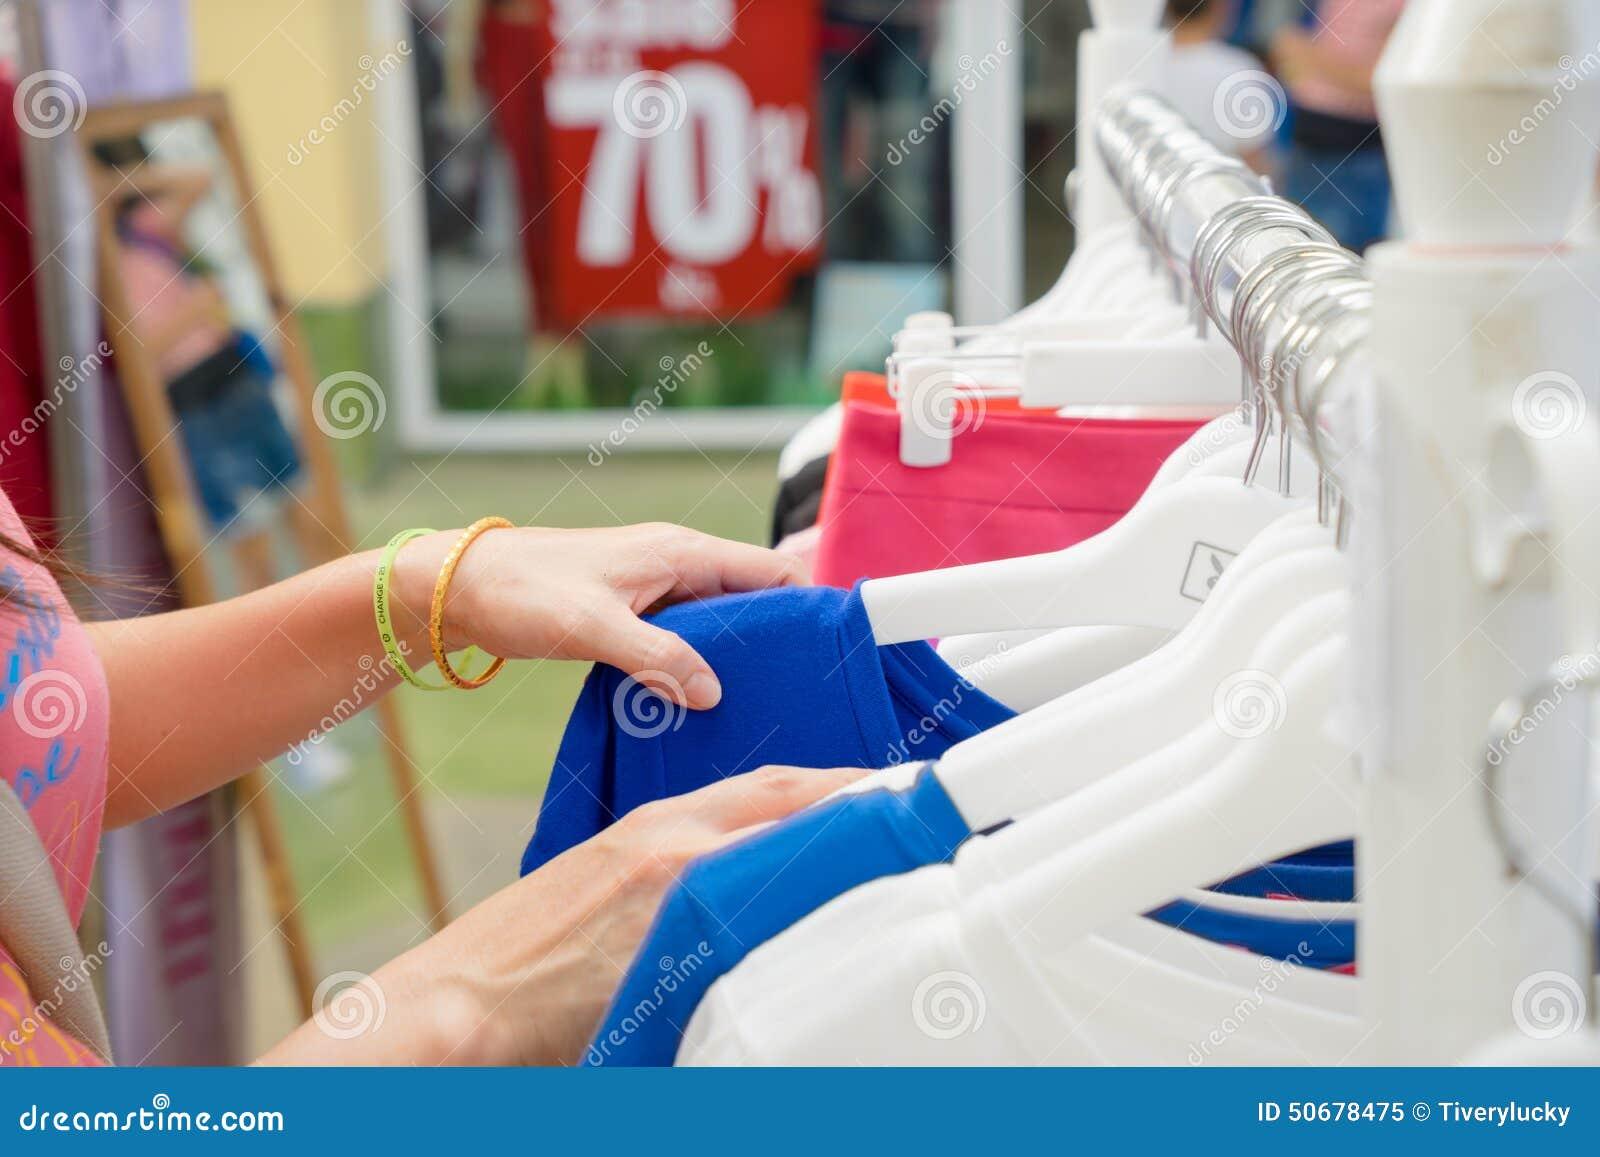 Download 购物在衣裳存储 库存图片. 图片 包括有 表达式, 客户, 快乐, 人力, 生活方式, 室内, 豪华, 女孩 - 50678475